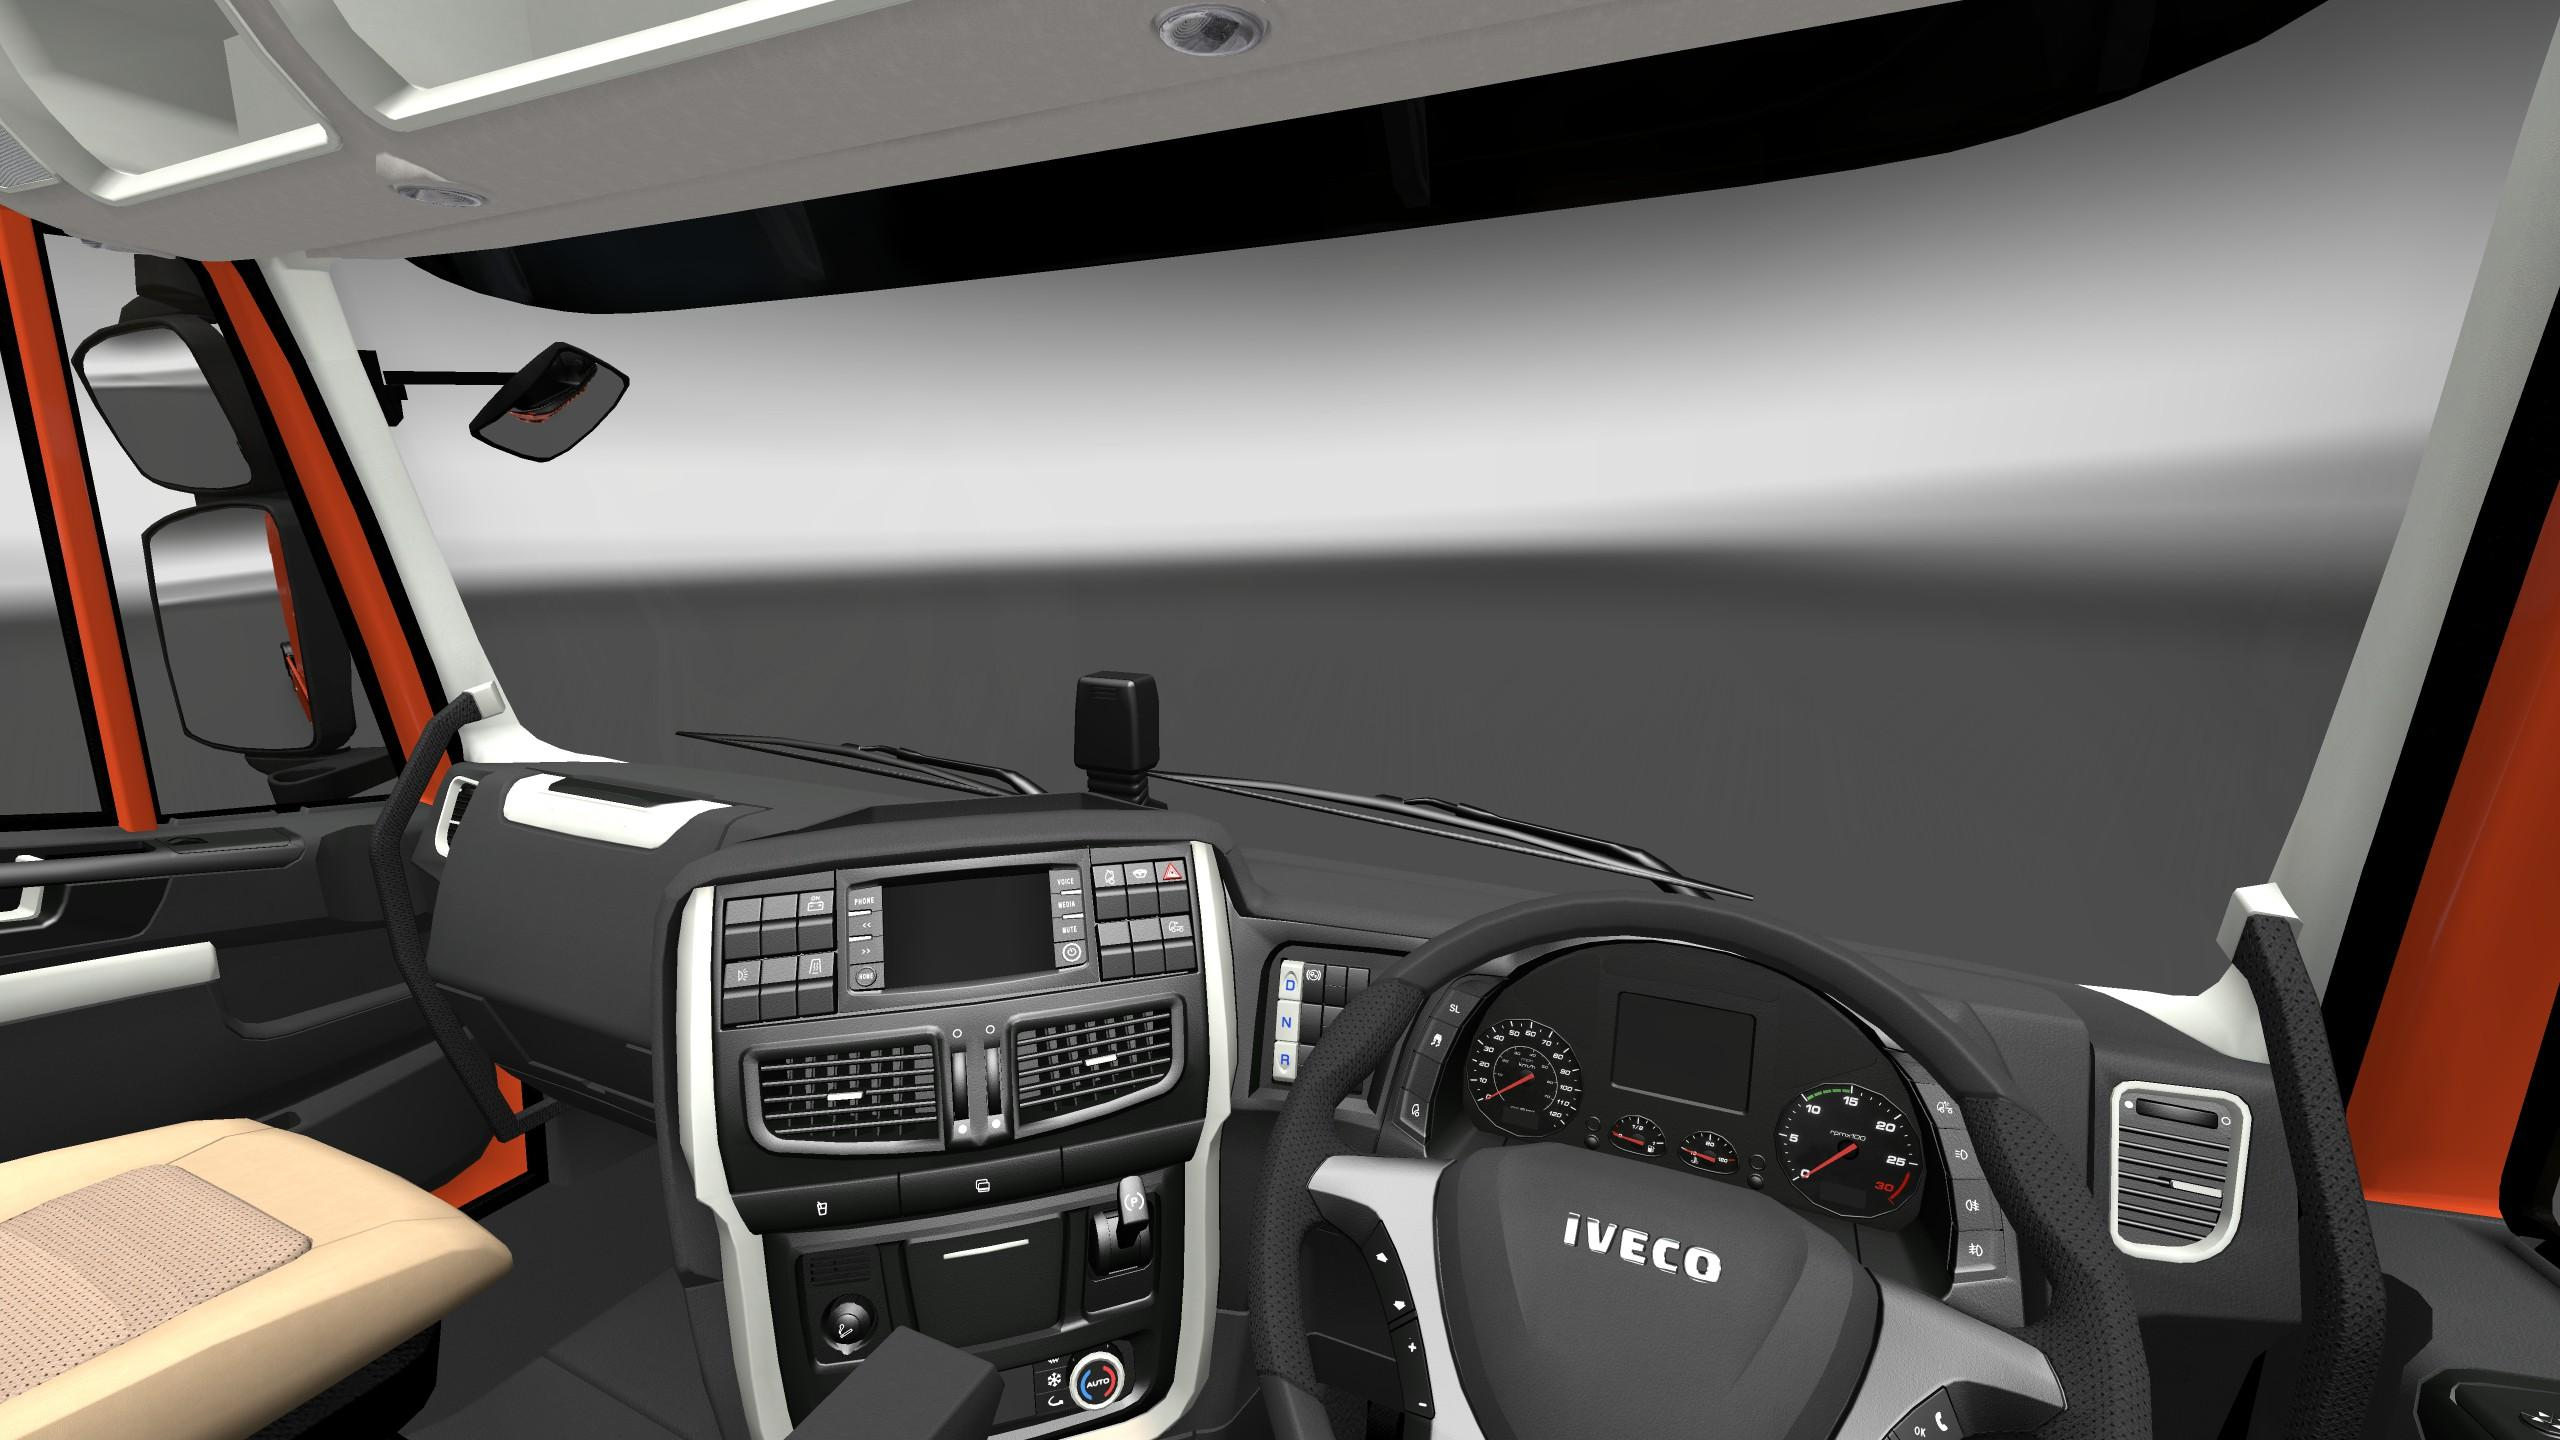 Iveco Stralis Hi Way Interior Exterior Rework V1 1 Mod